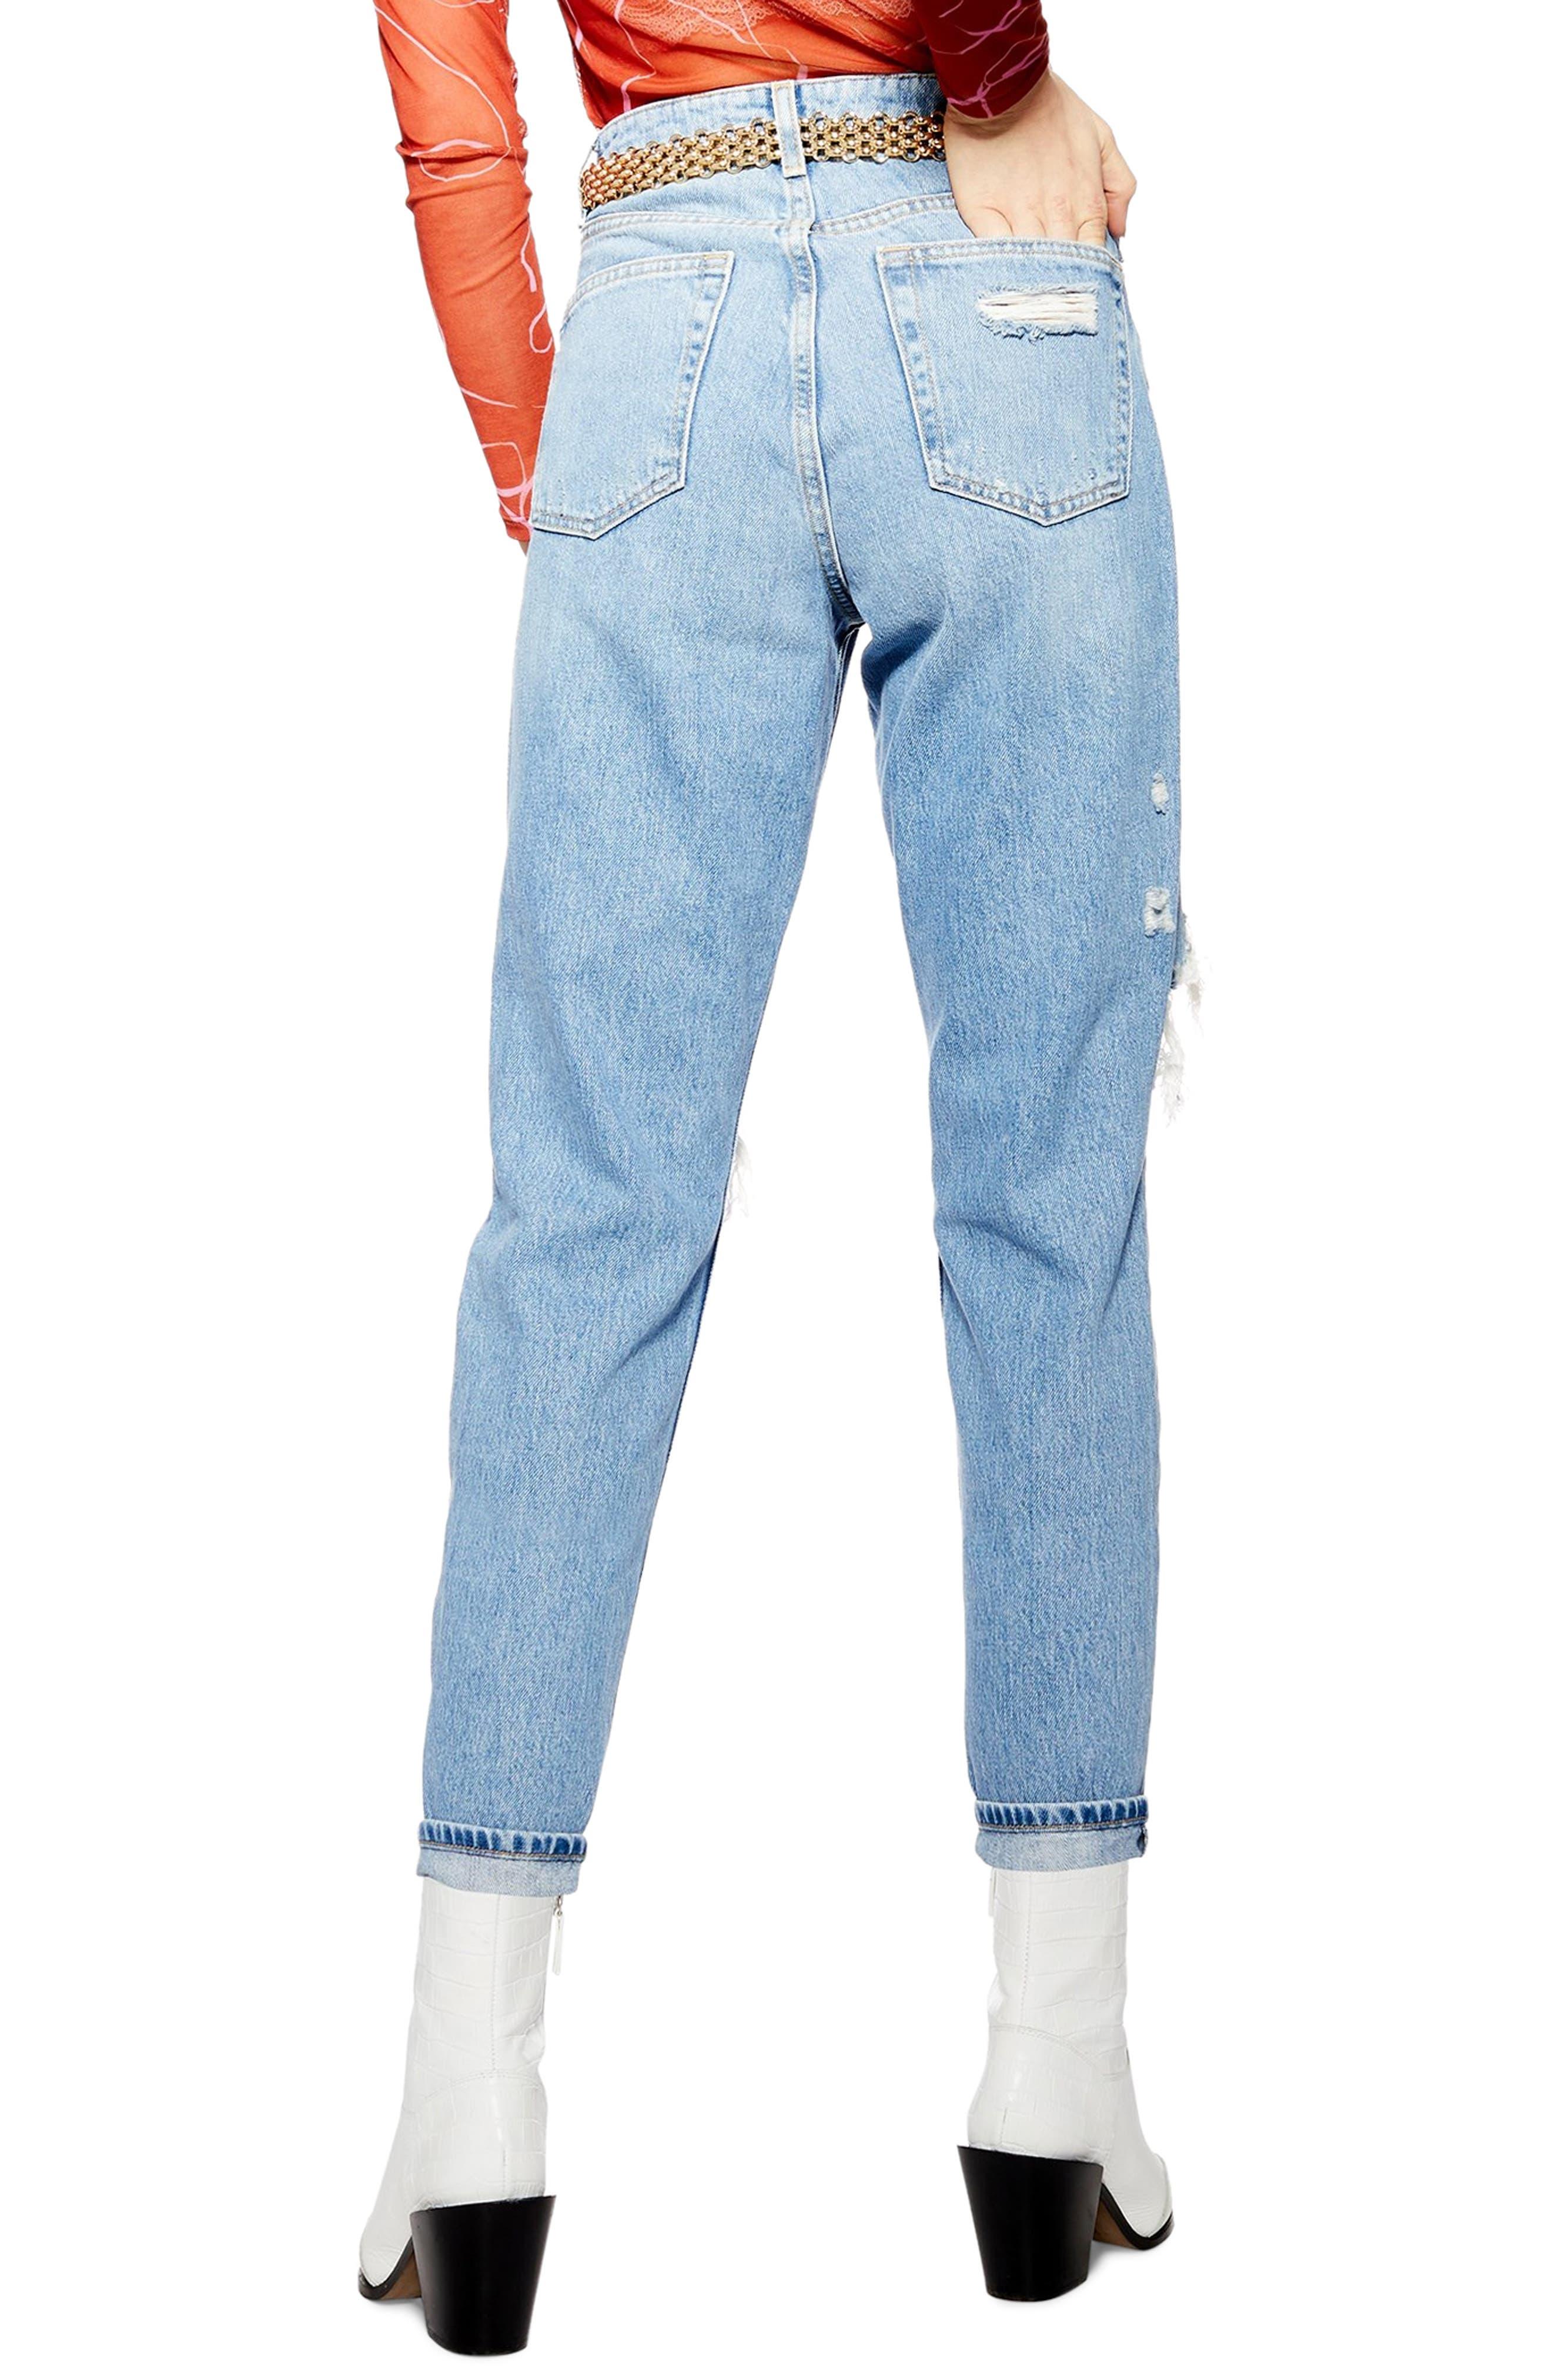 TOPSHOP,                             Destroyed Mom Jeans,                             Alternate thumbnail 2, color,                             BLEACH